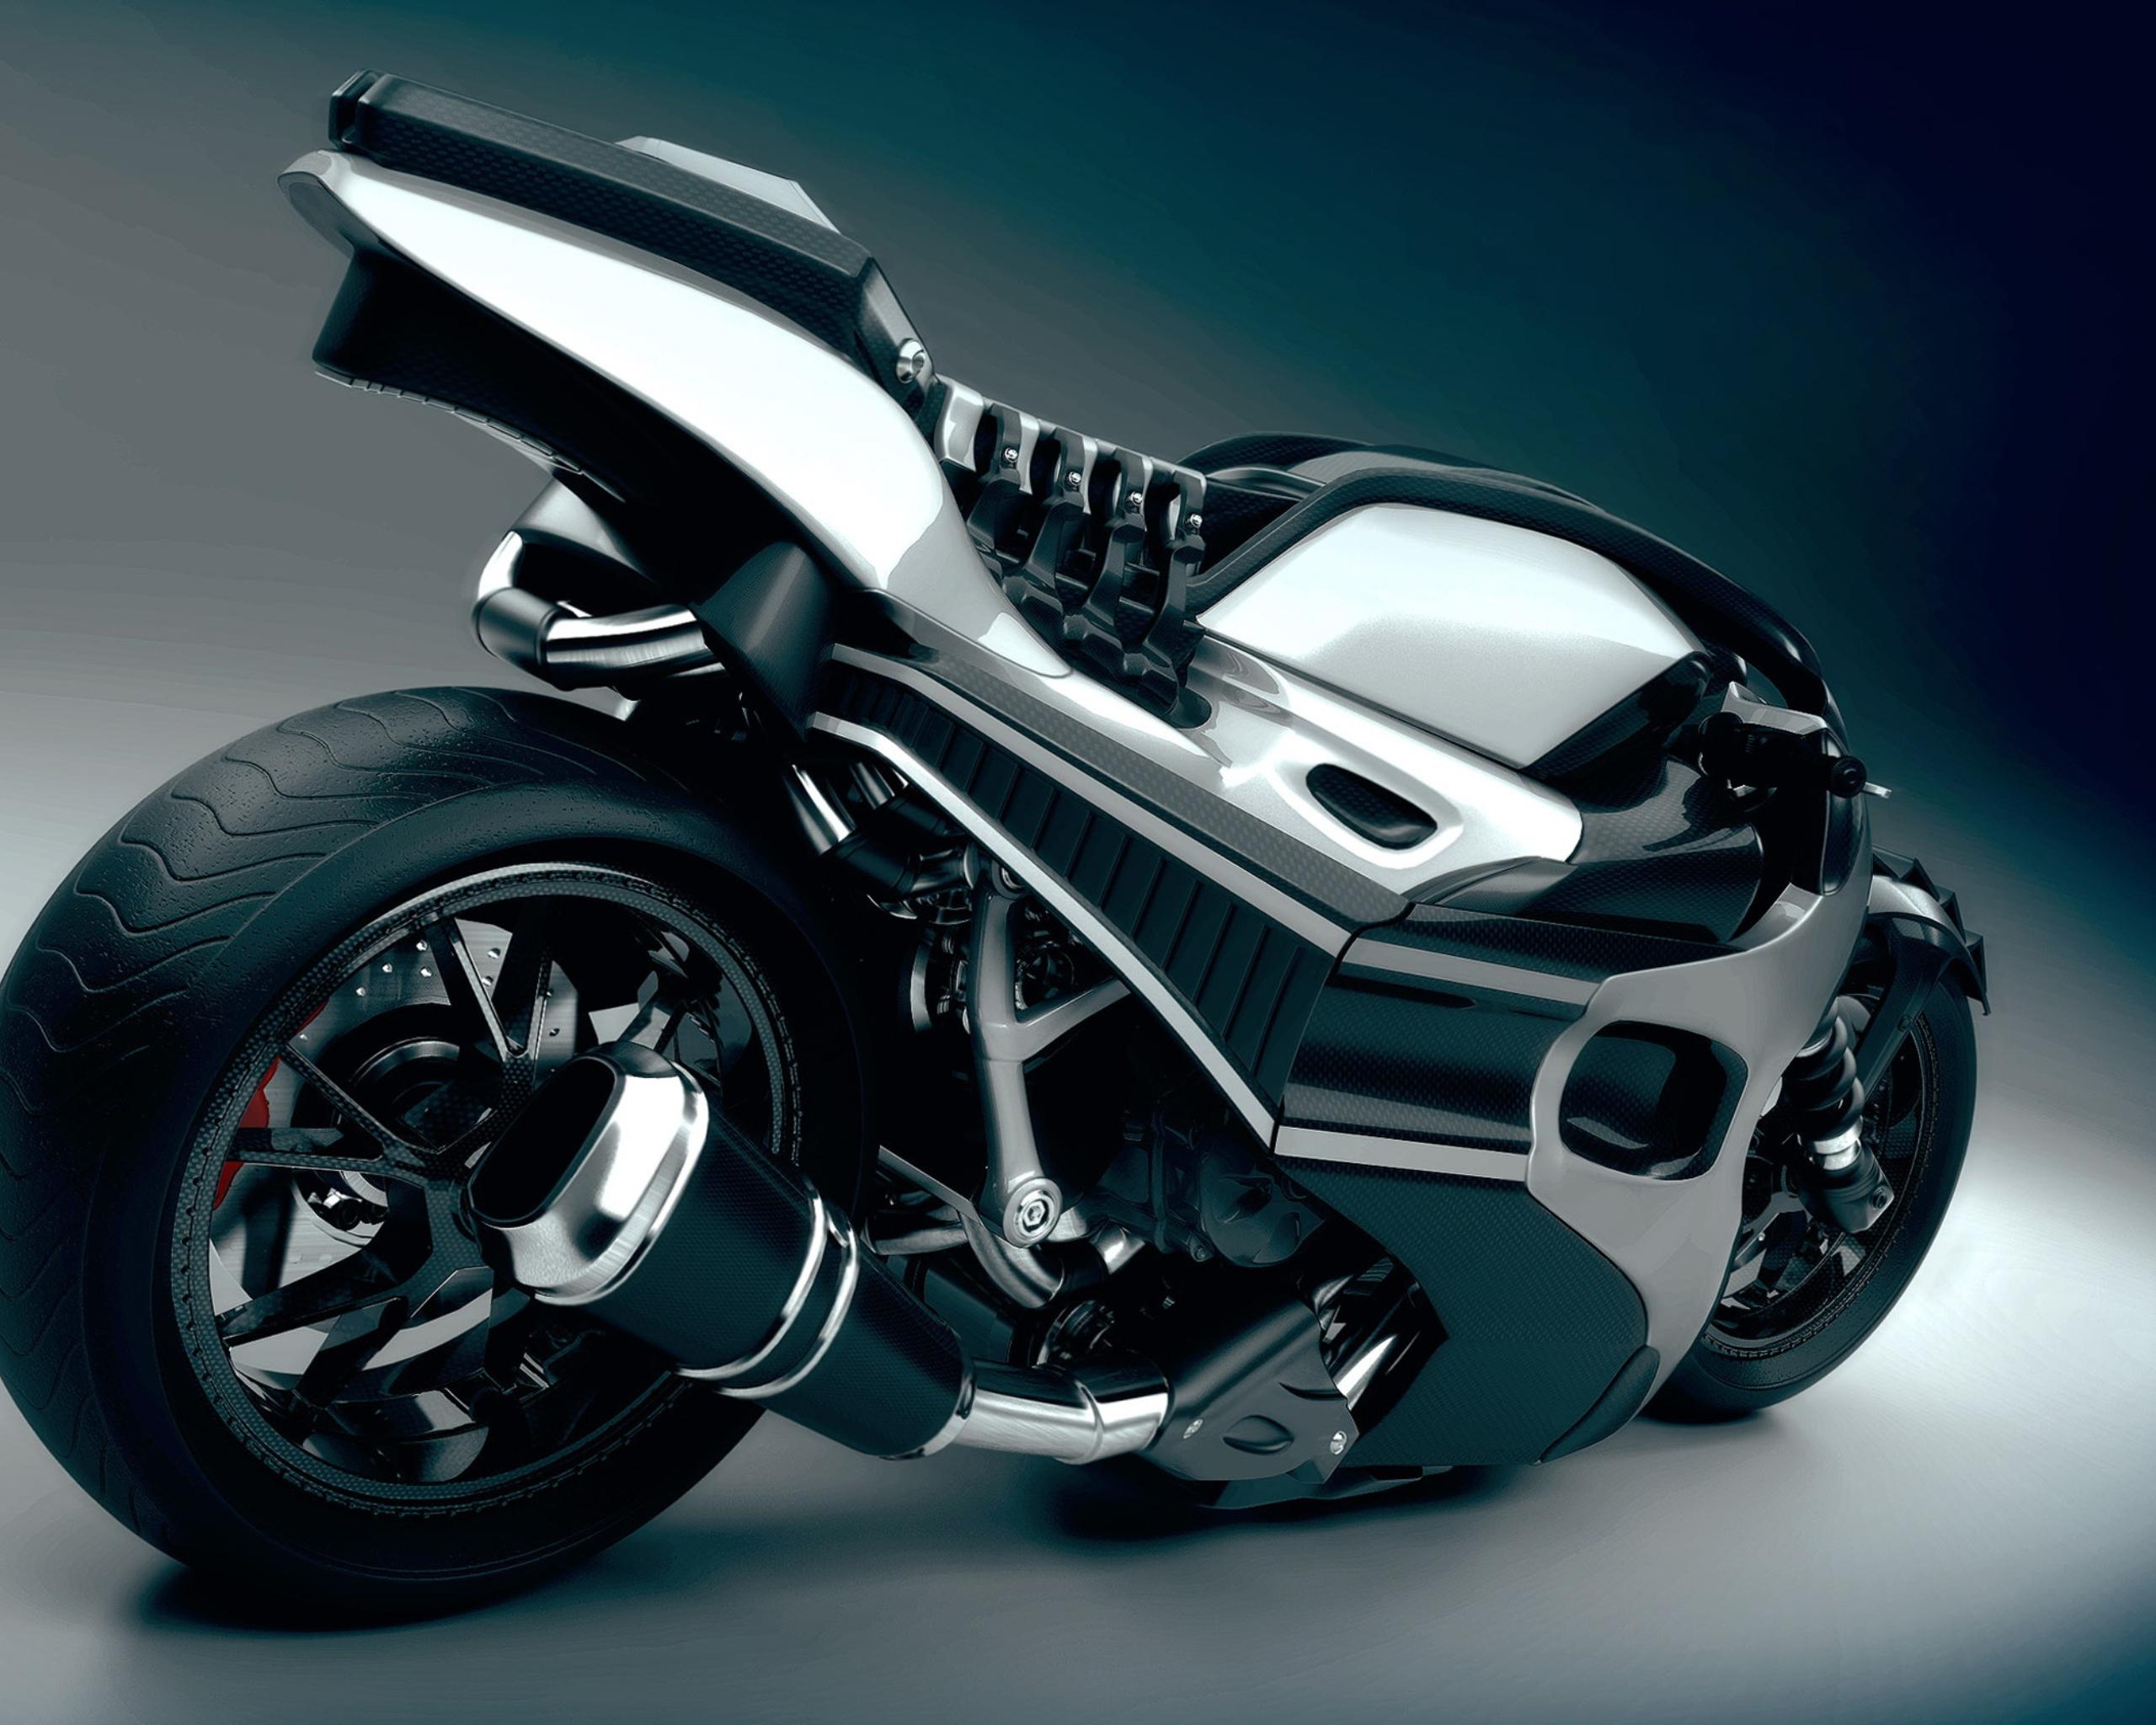 Обои Мотоцикл, просто монстр, хром. Мотоциклы foto 6